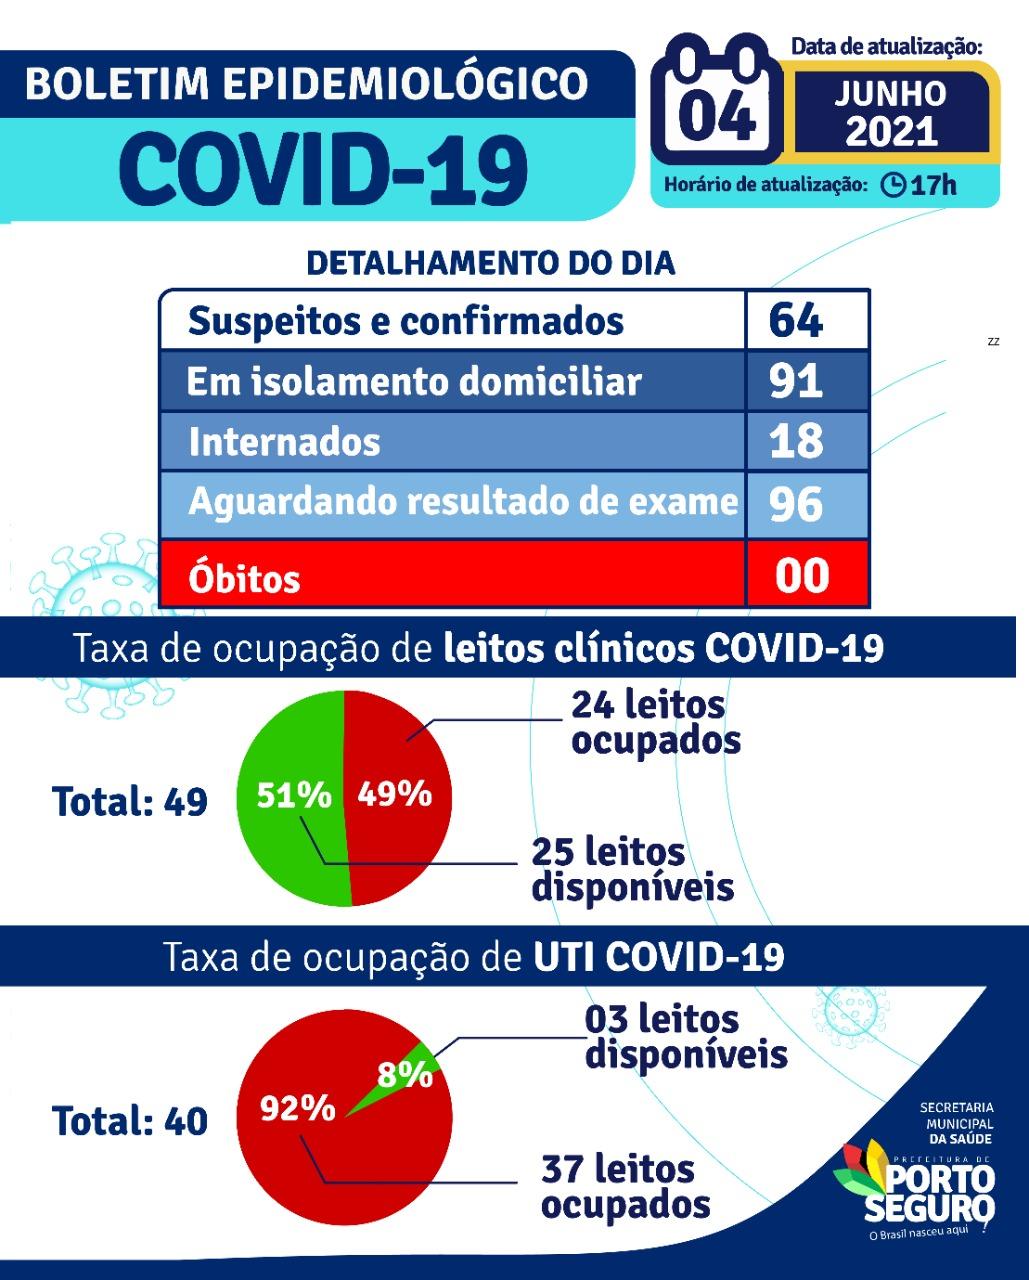 Porto Seguro: Boletim Epidemiológico Covid-19 (04/Junho) 22